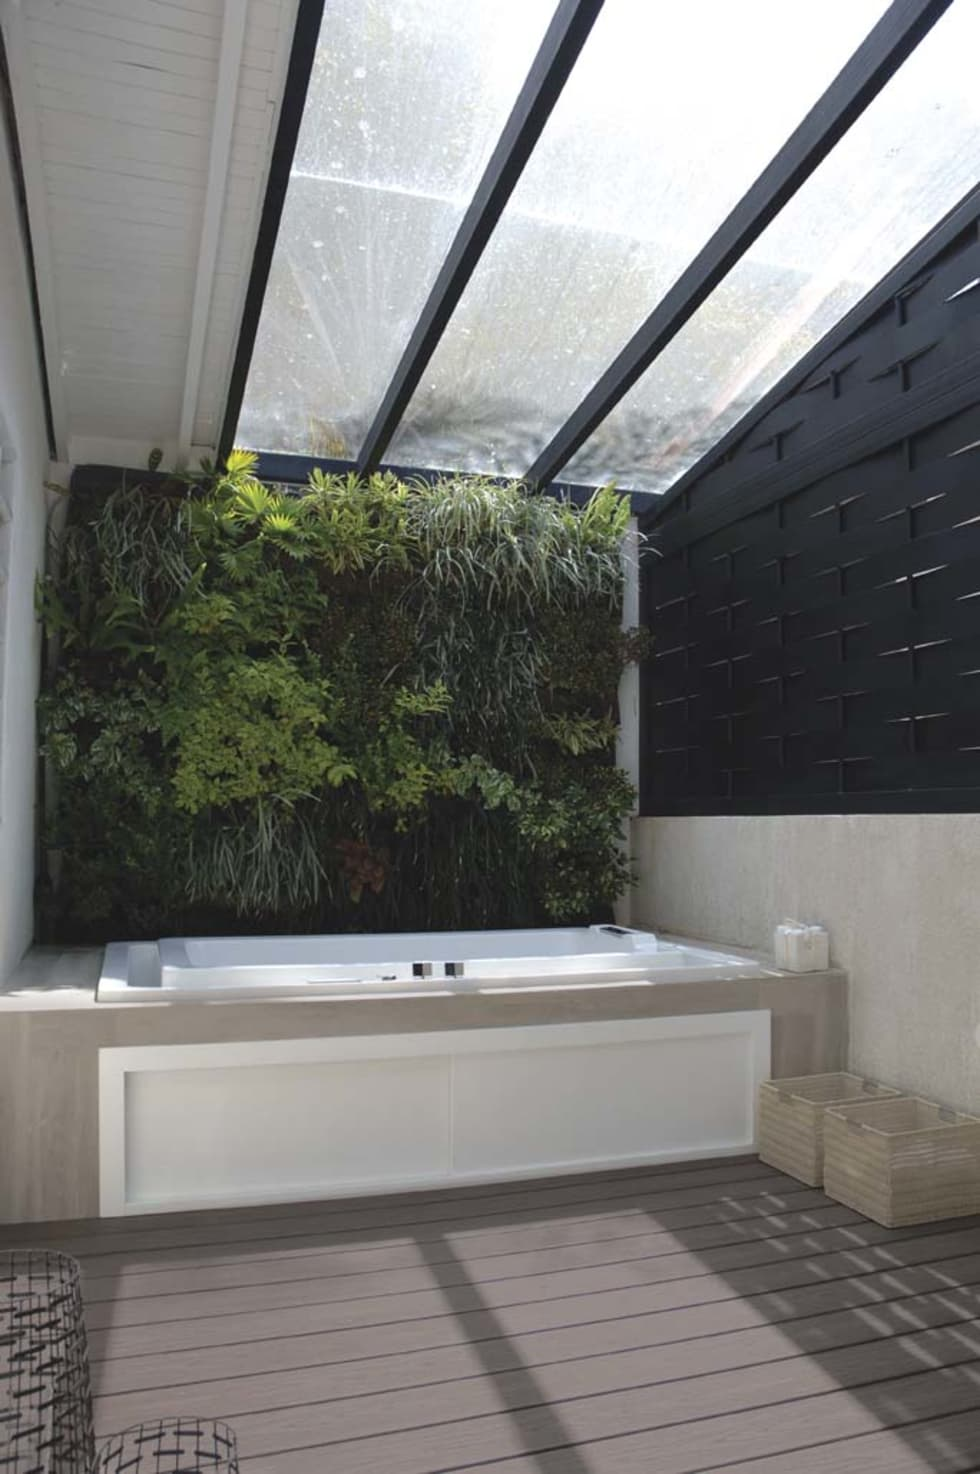 Casa 575. Terraza interna: Jardines de estilo moderno por Arq Renny Molina